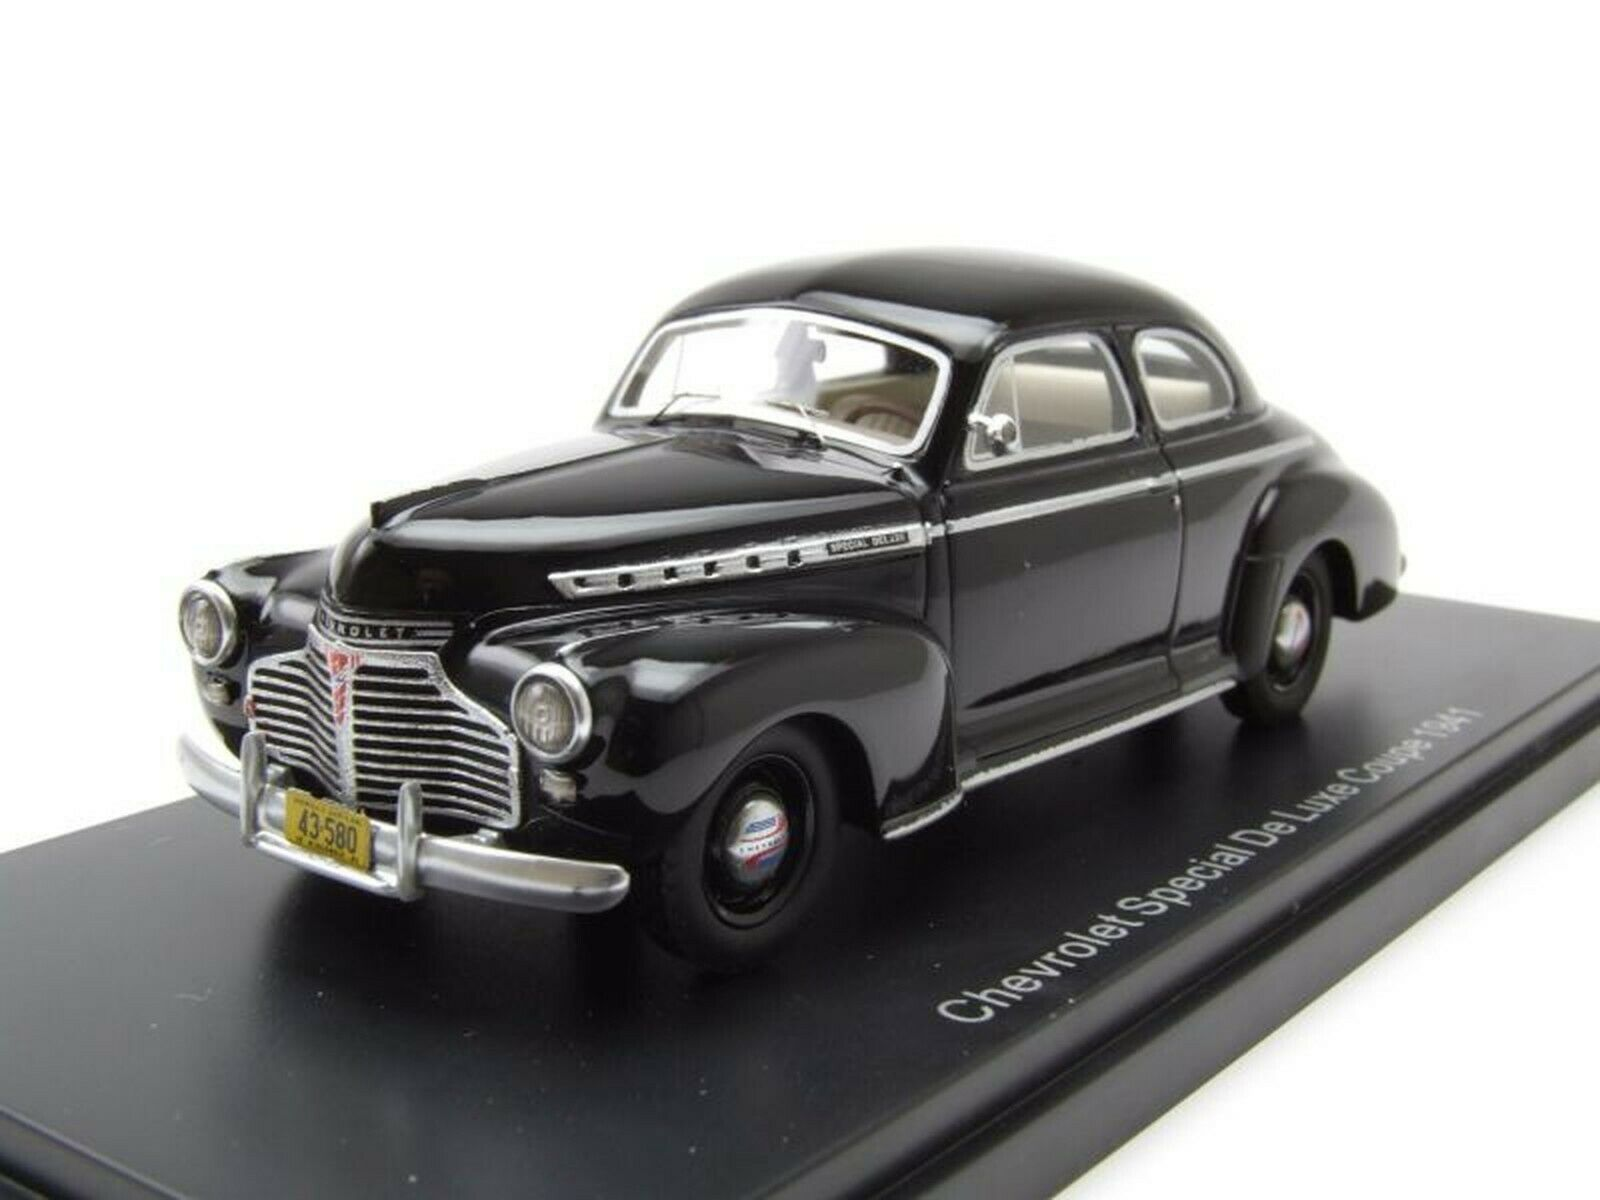 NEO 1 43 CHEVROLET SPECIAL De Luxe Coupe, negro